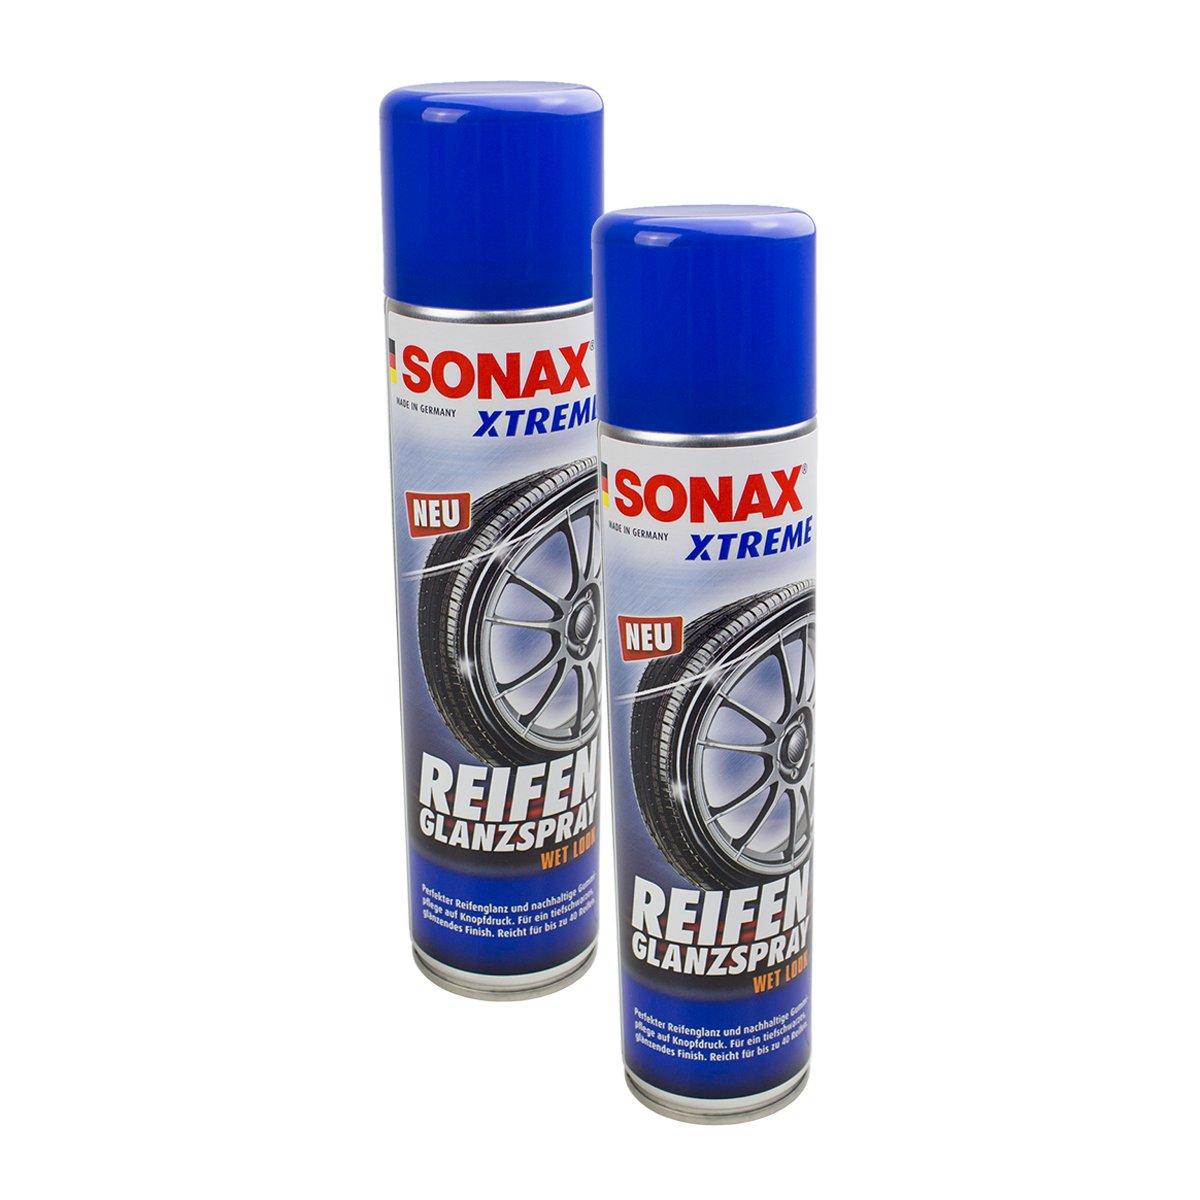 SONAX 2 x 02353000 Xtreme Neumá ticos Brillo Spray Wet Look Neumá ticos Spray 400 ML